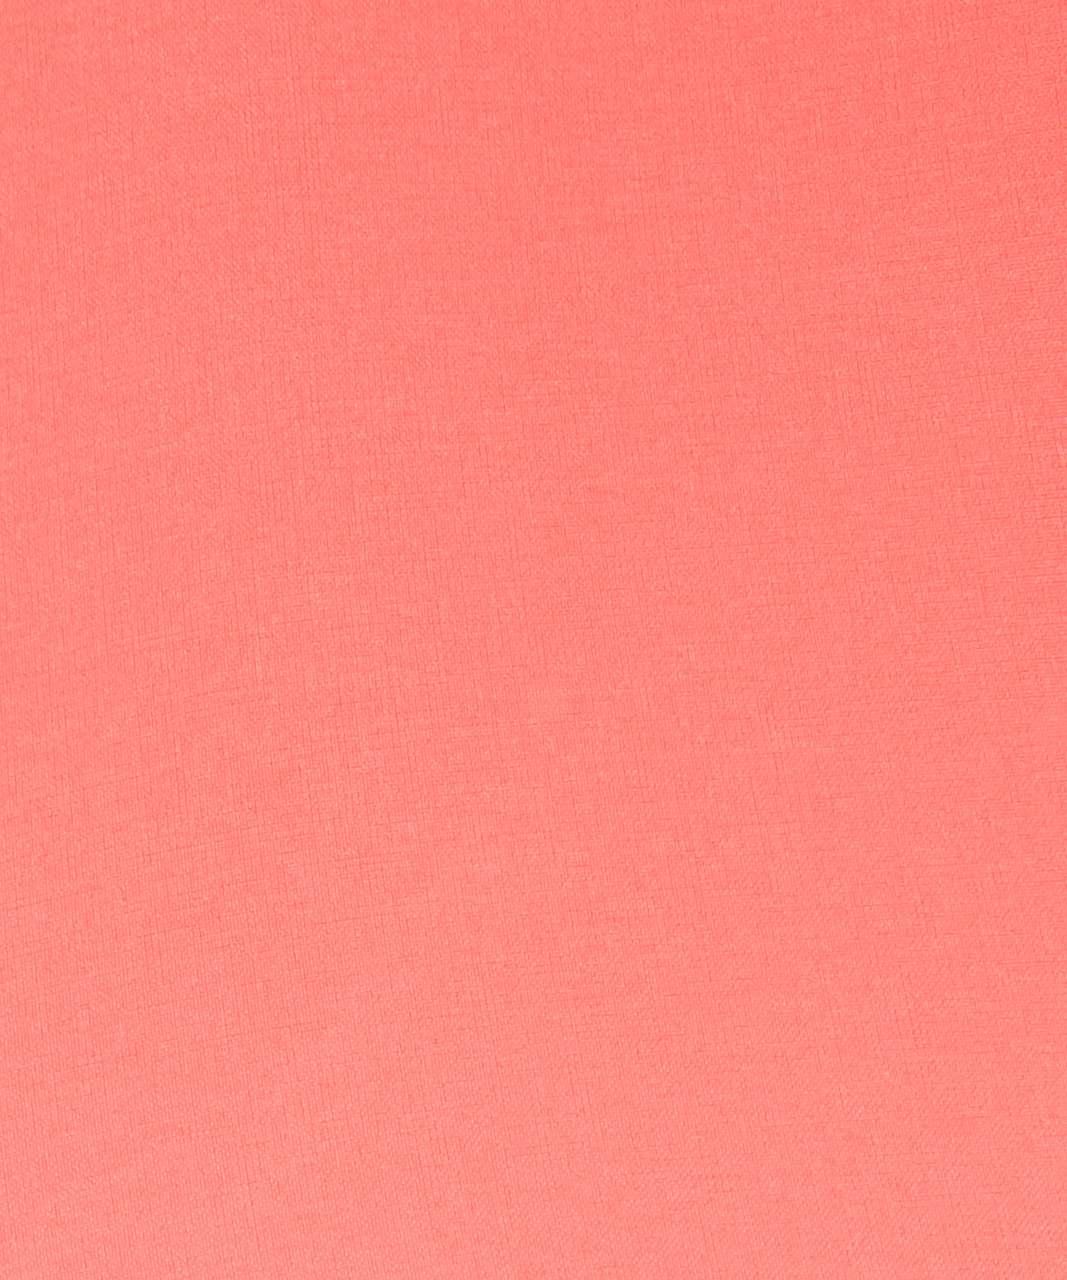 "Lululemon Hotty Hot Short *High-Rise Long 4"" - Light Coral"